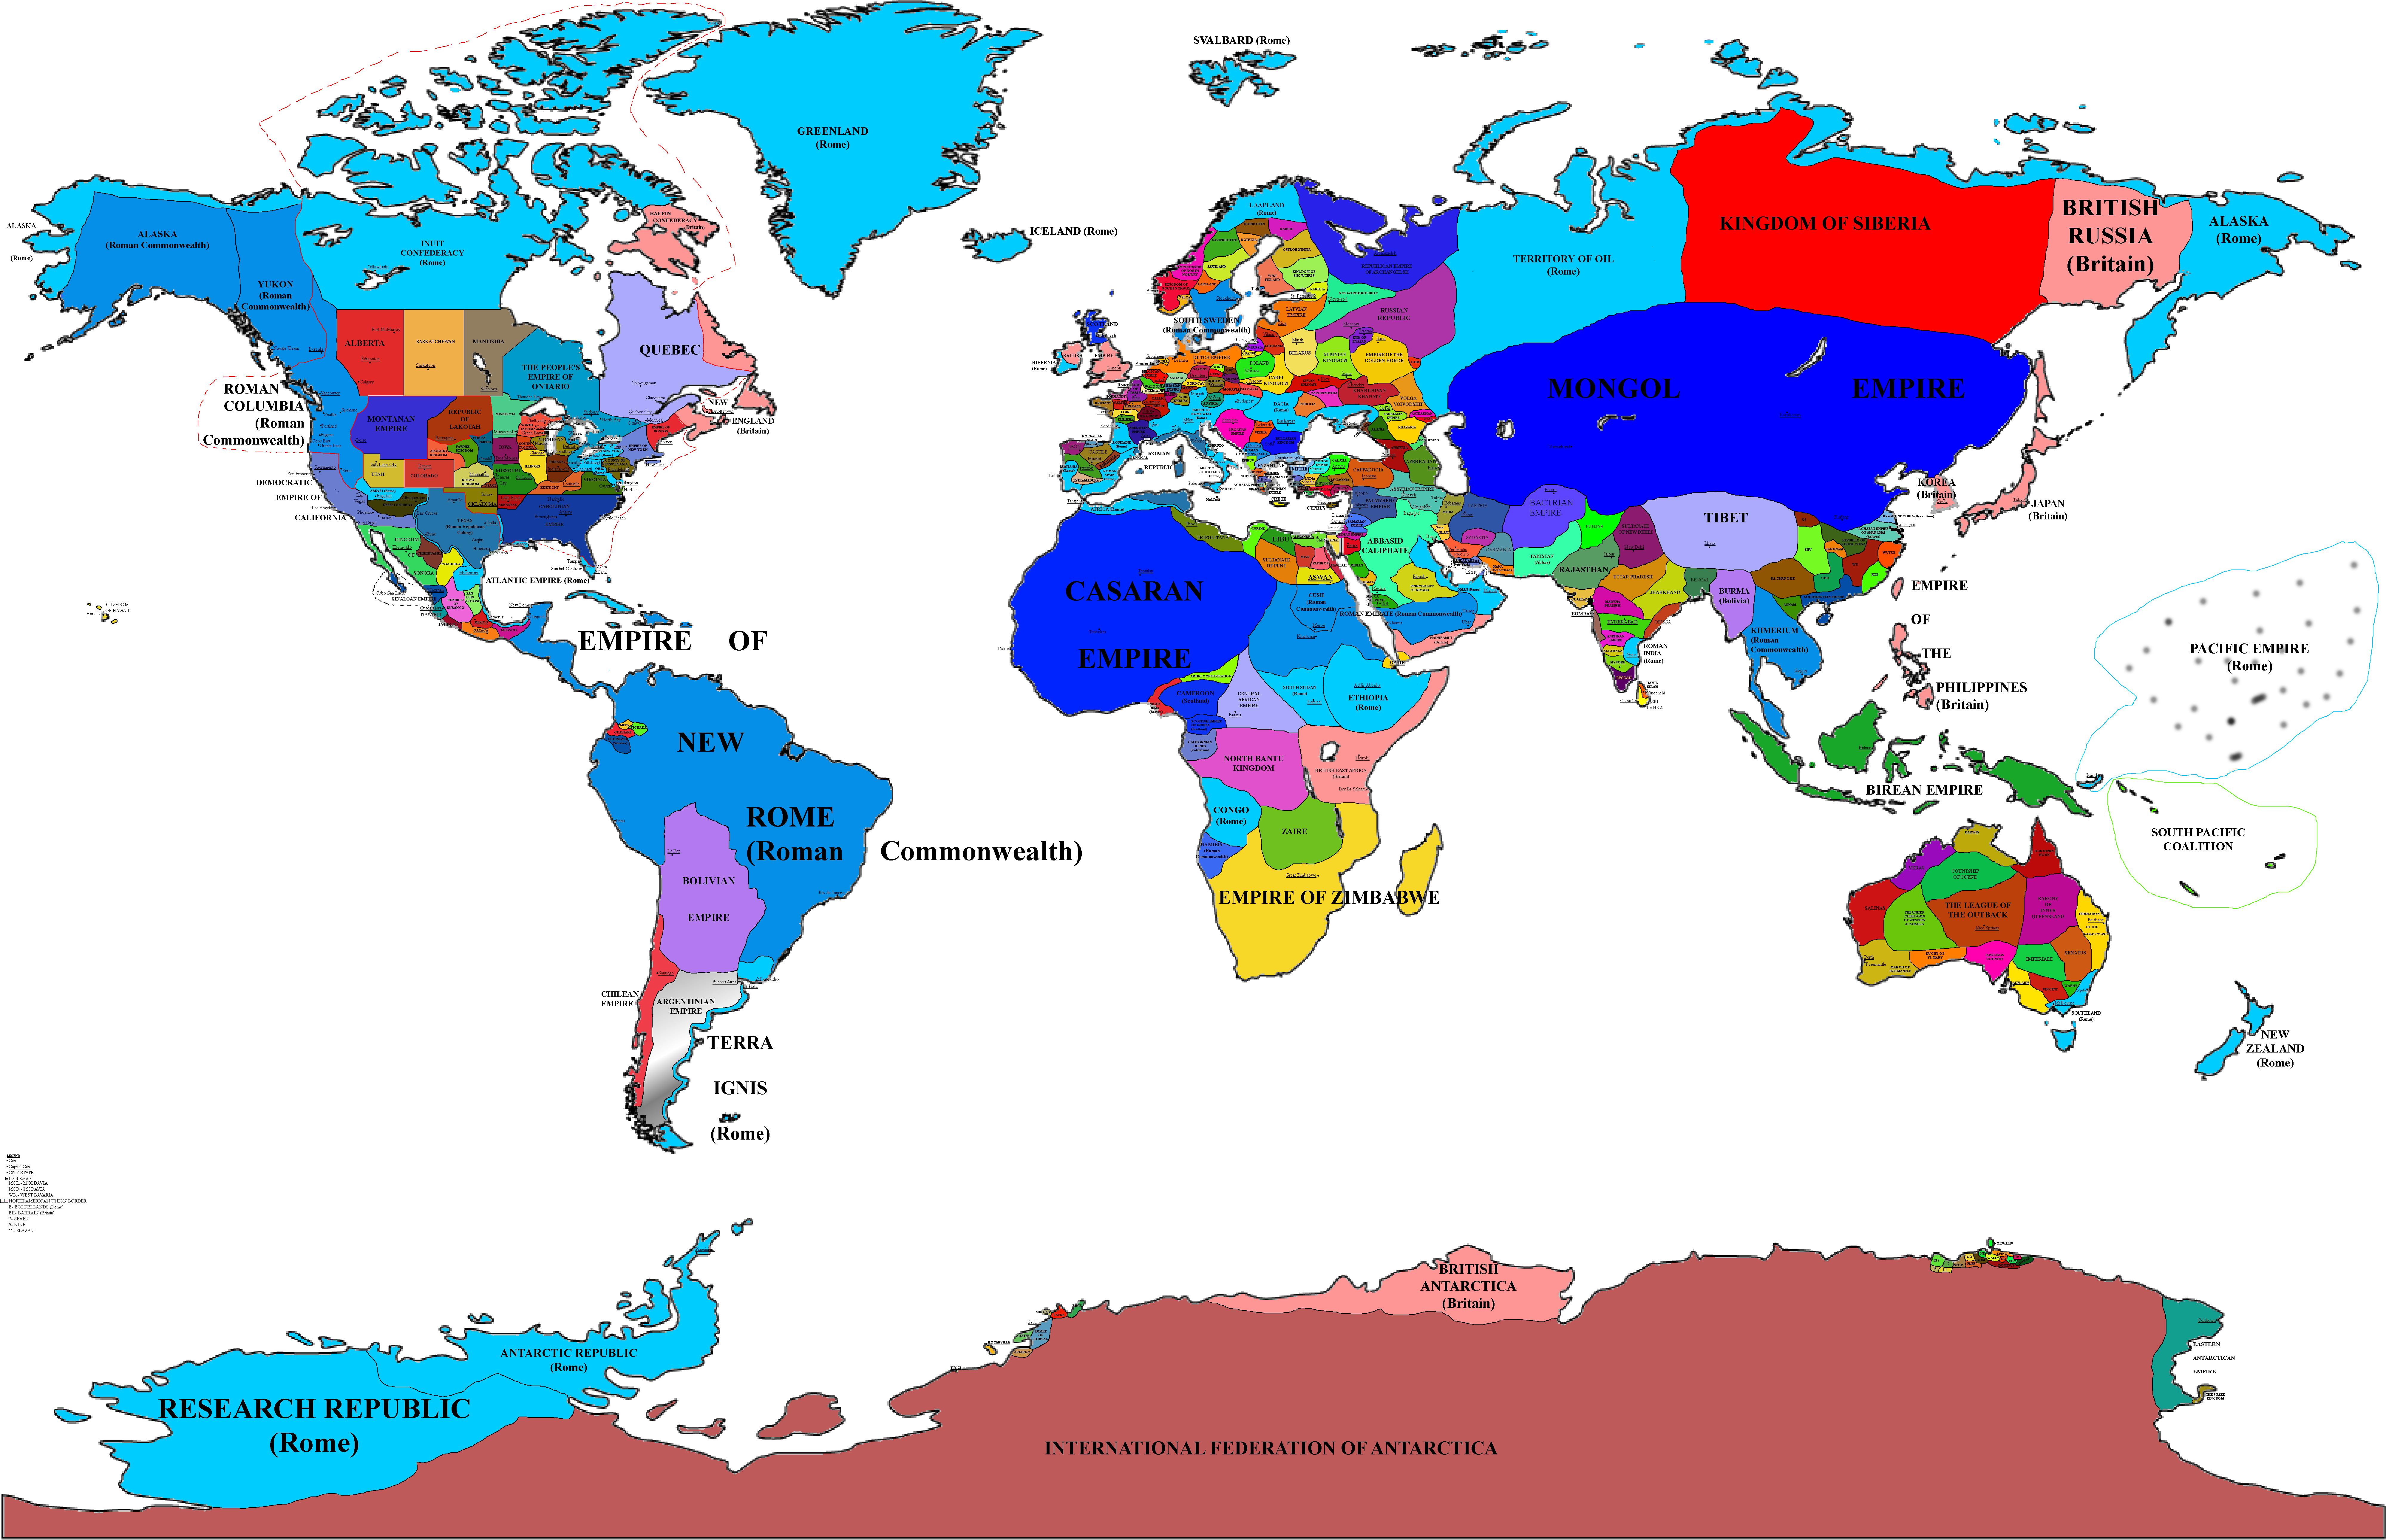 Vicendum World Map Updated 3 by Danielg342 on DeviantArt